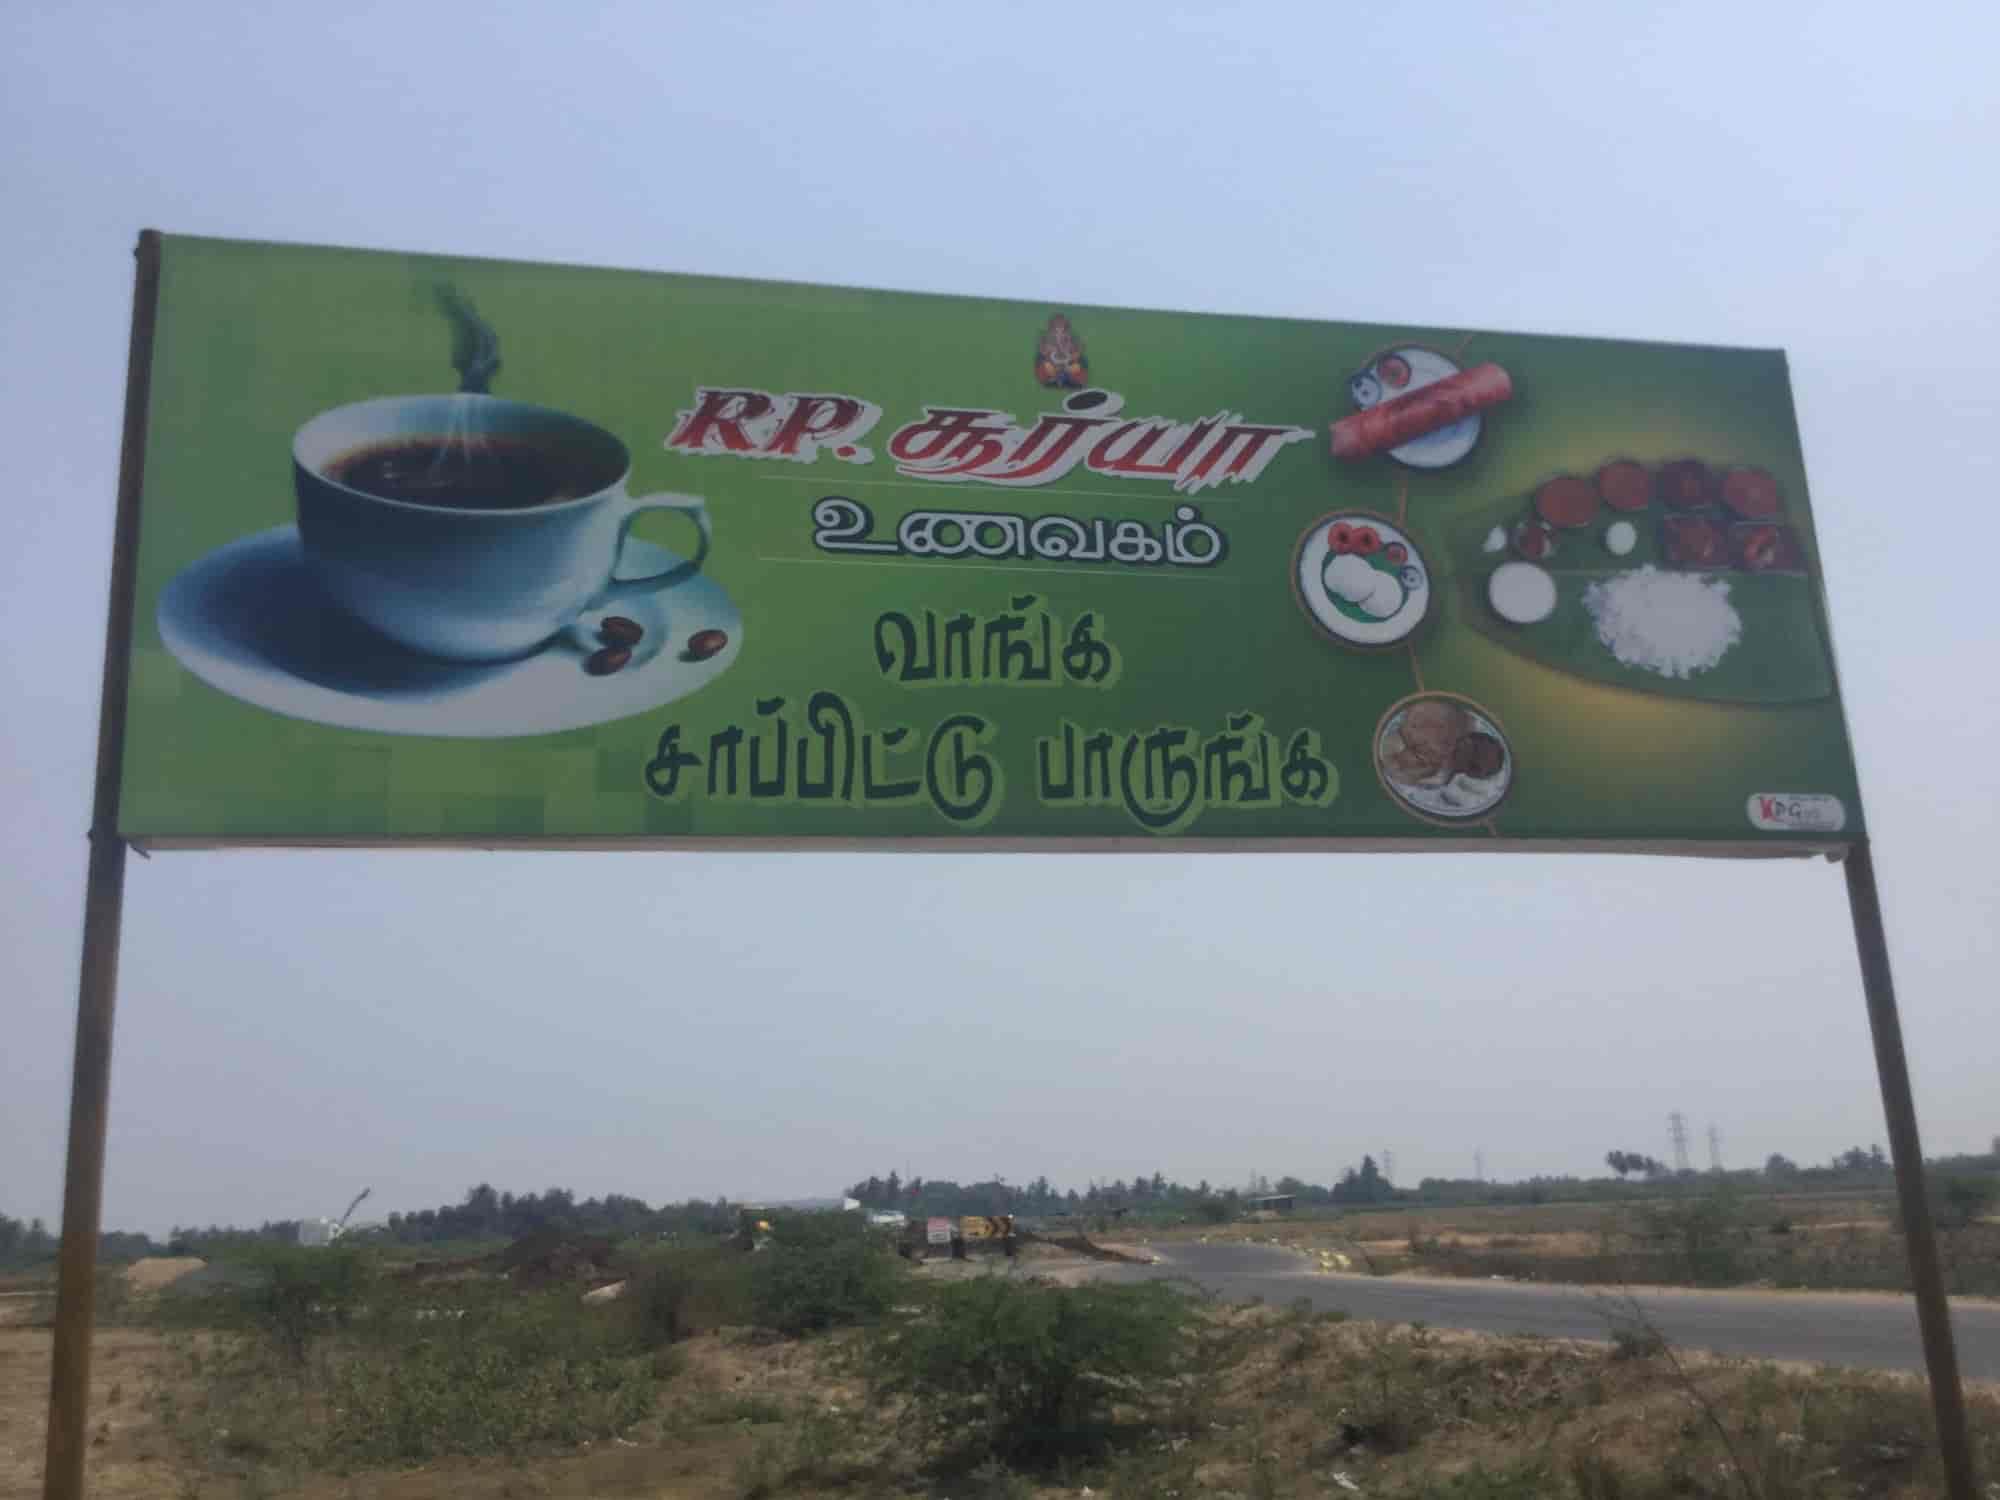 South Indian Restaurants in Vikravandi, Villupuram